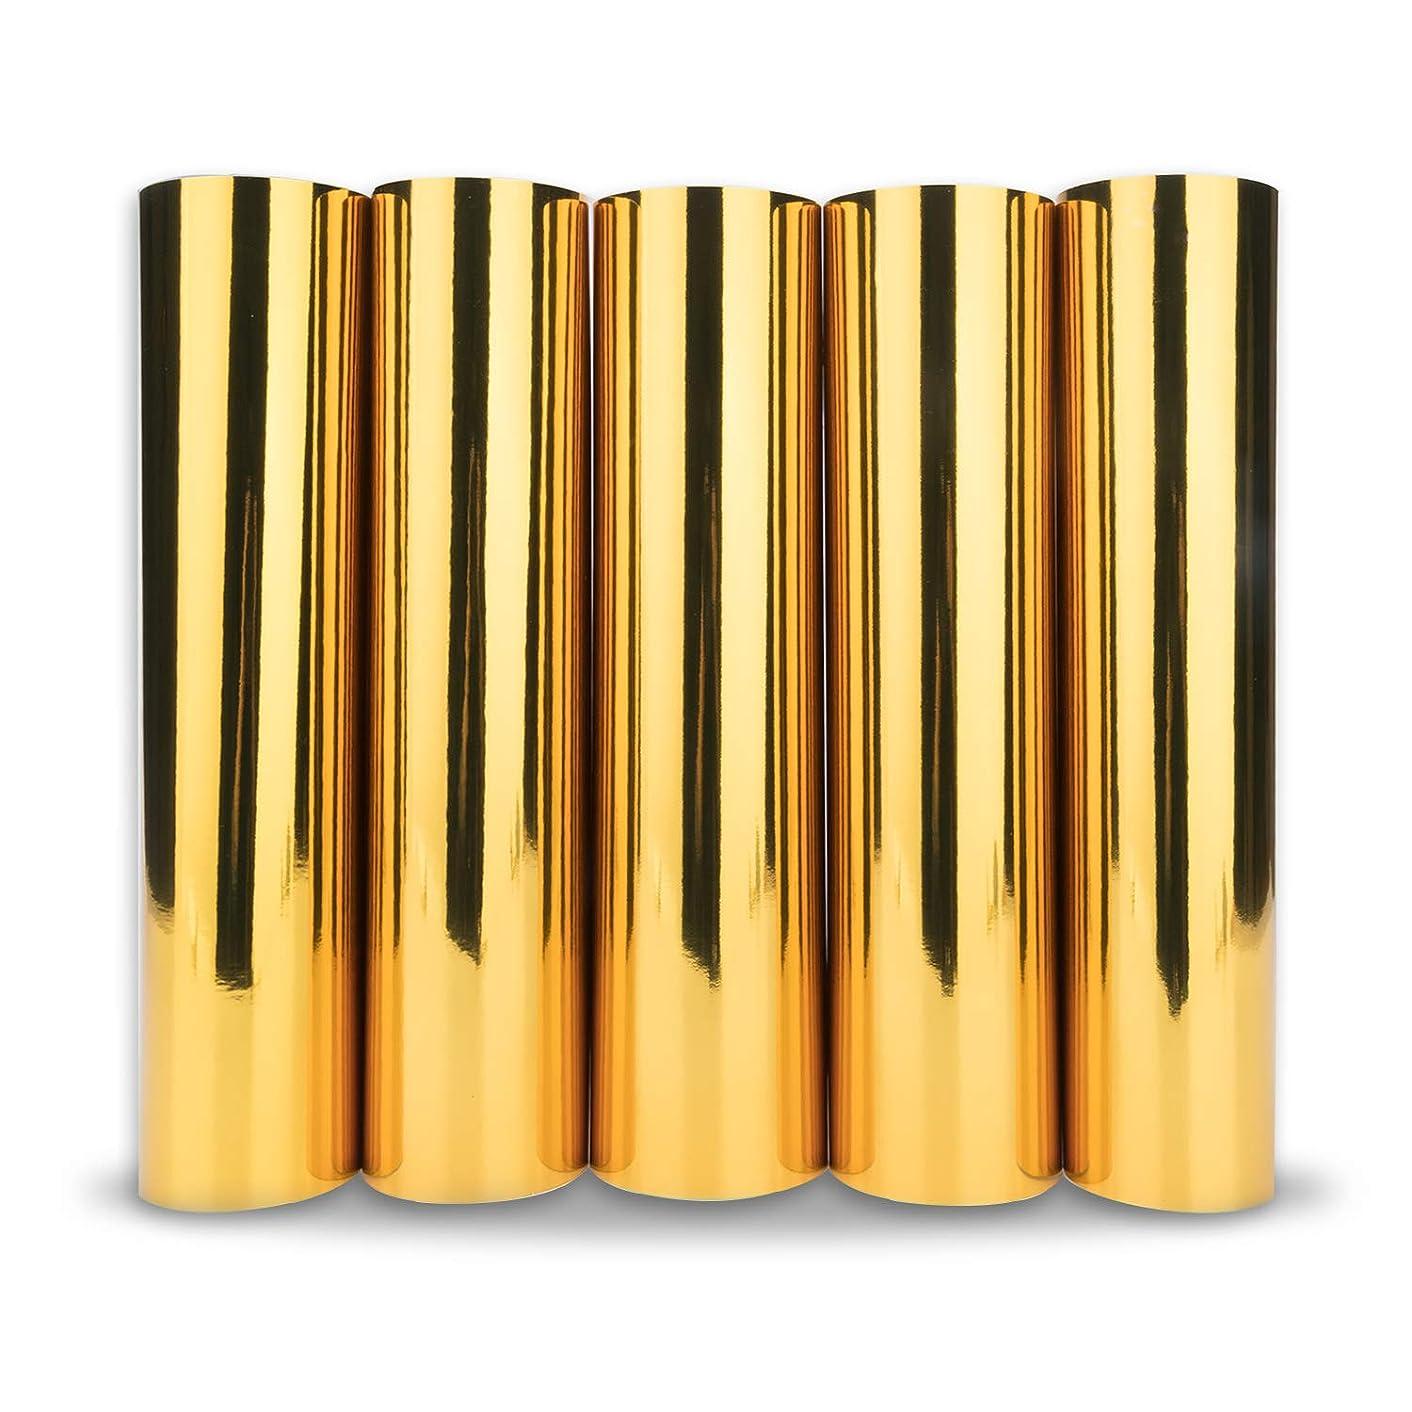 TECKWRAP Chrome Gold Adhesive Craft Vinyl Sheets